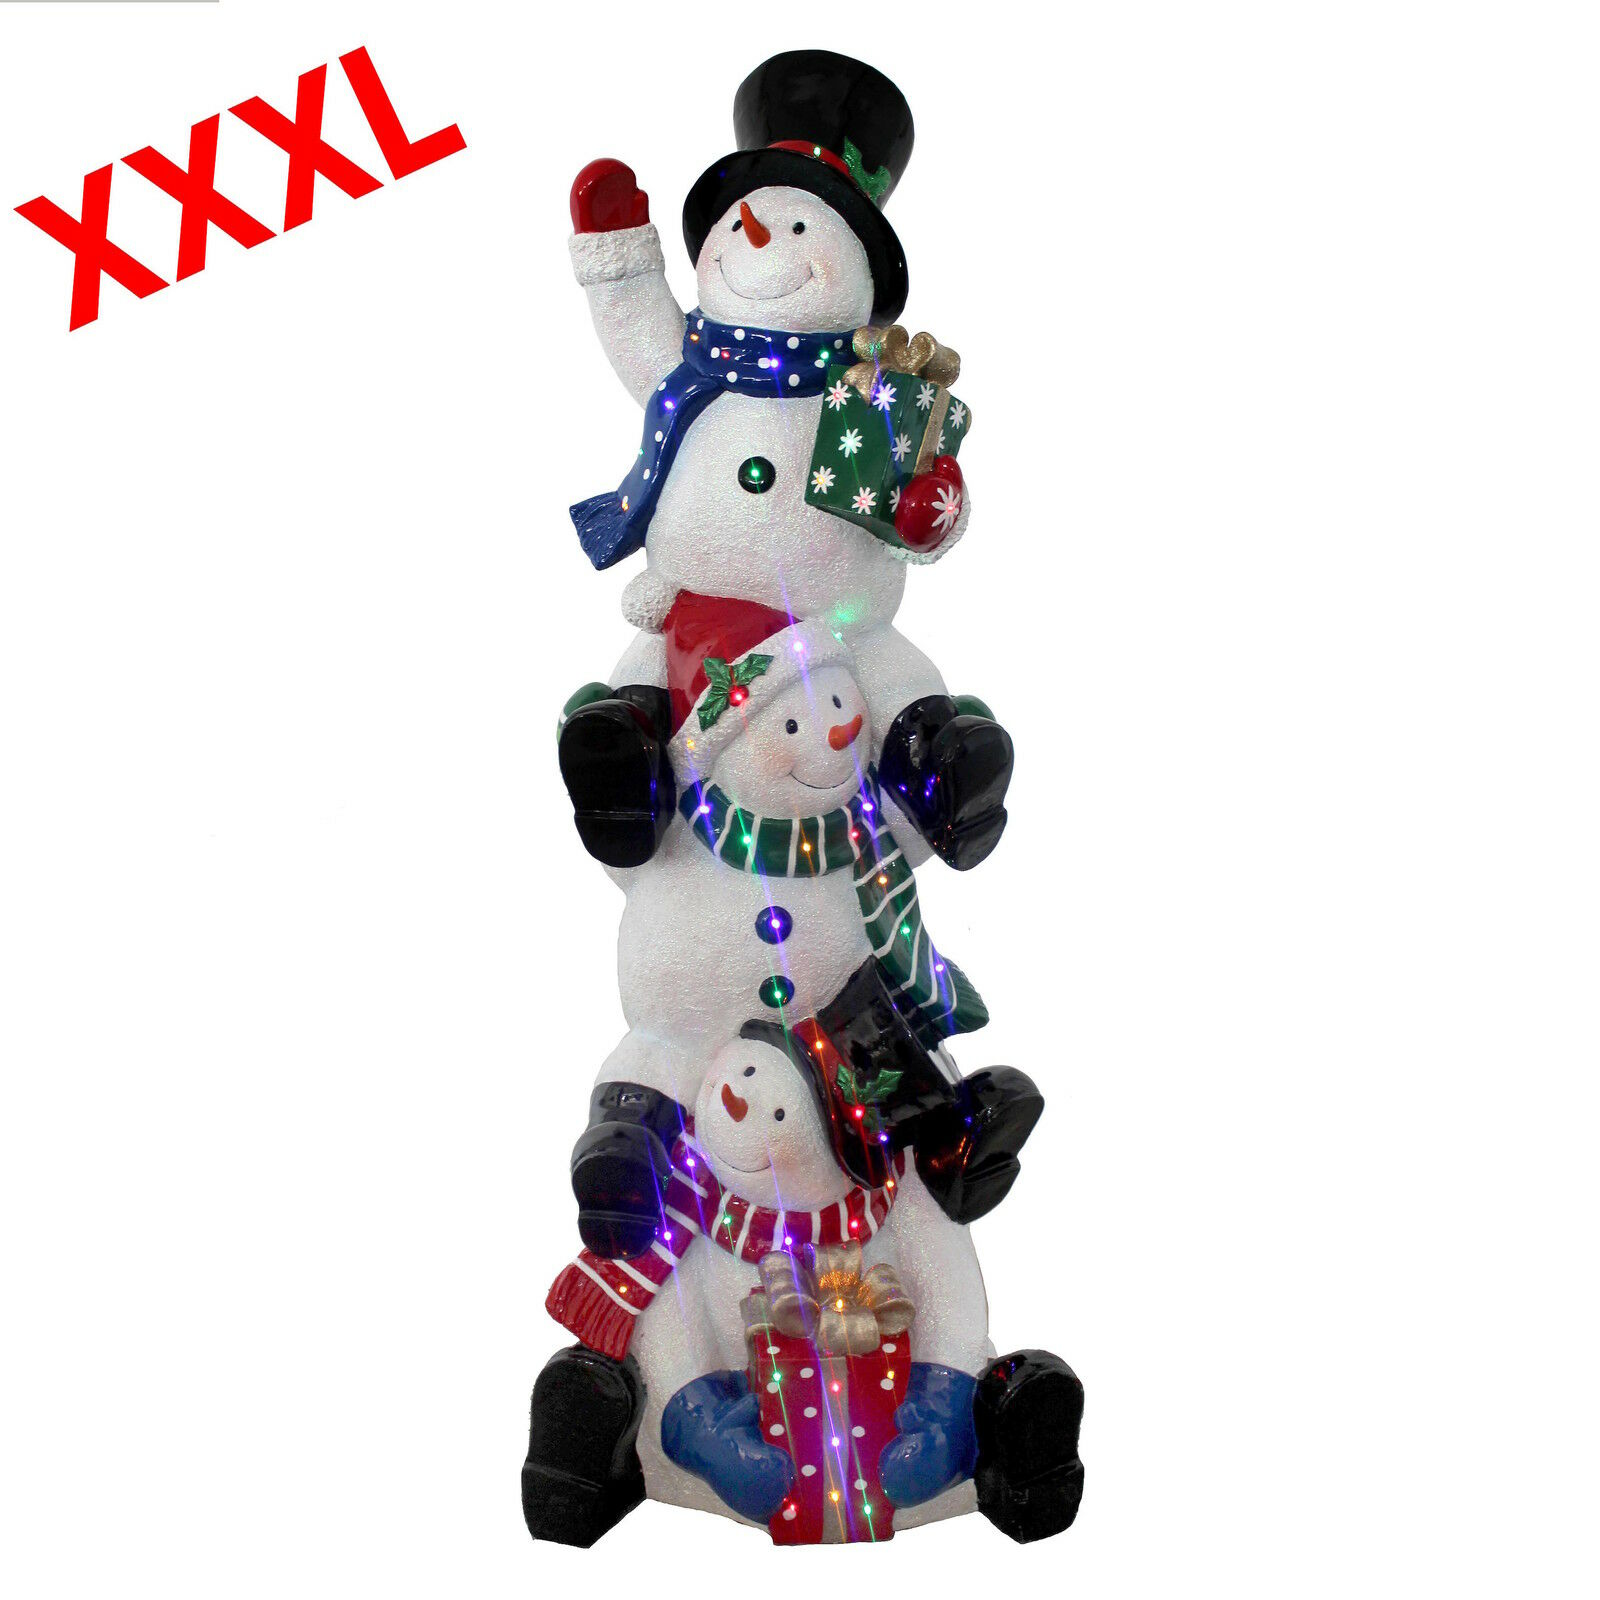 Giant Snowman Family Illuminated 152 cm Large Display Window Decoration 90254